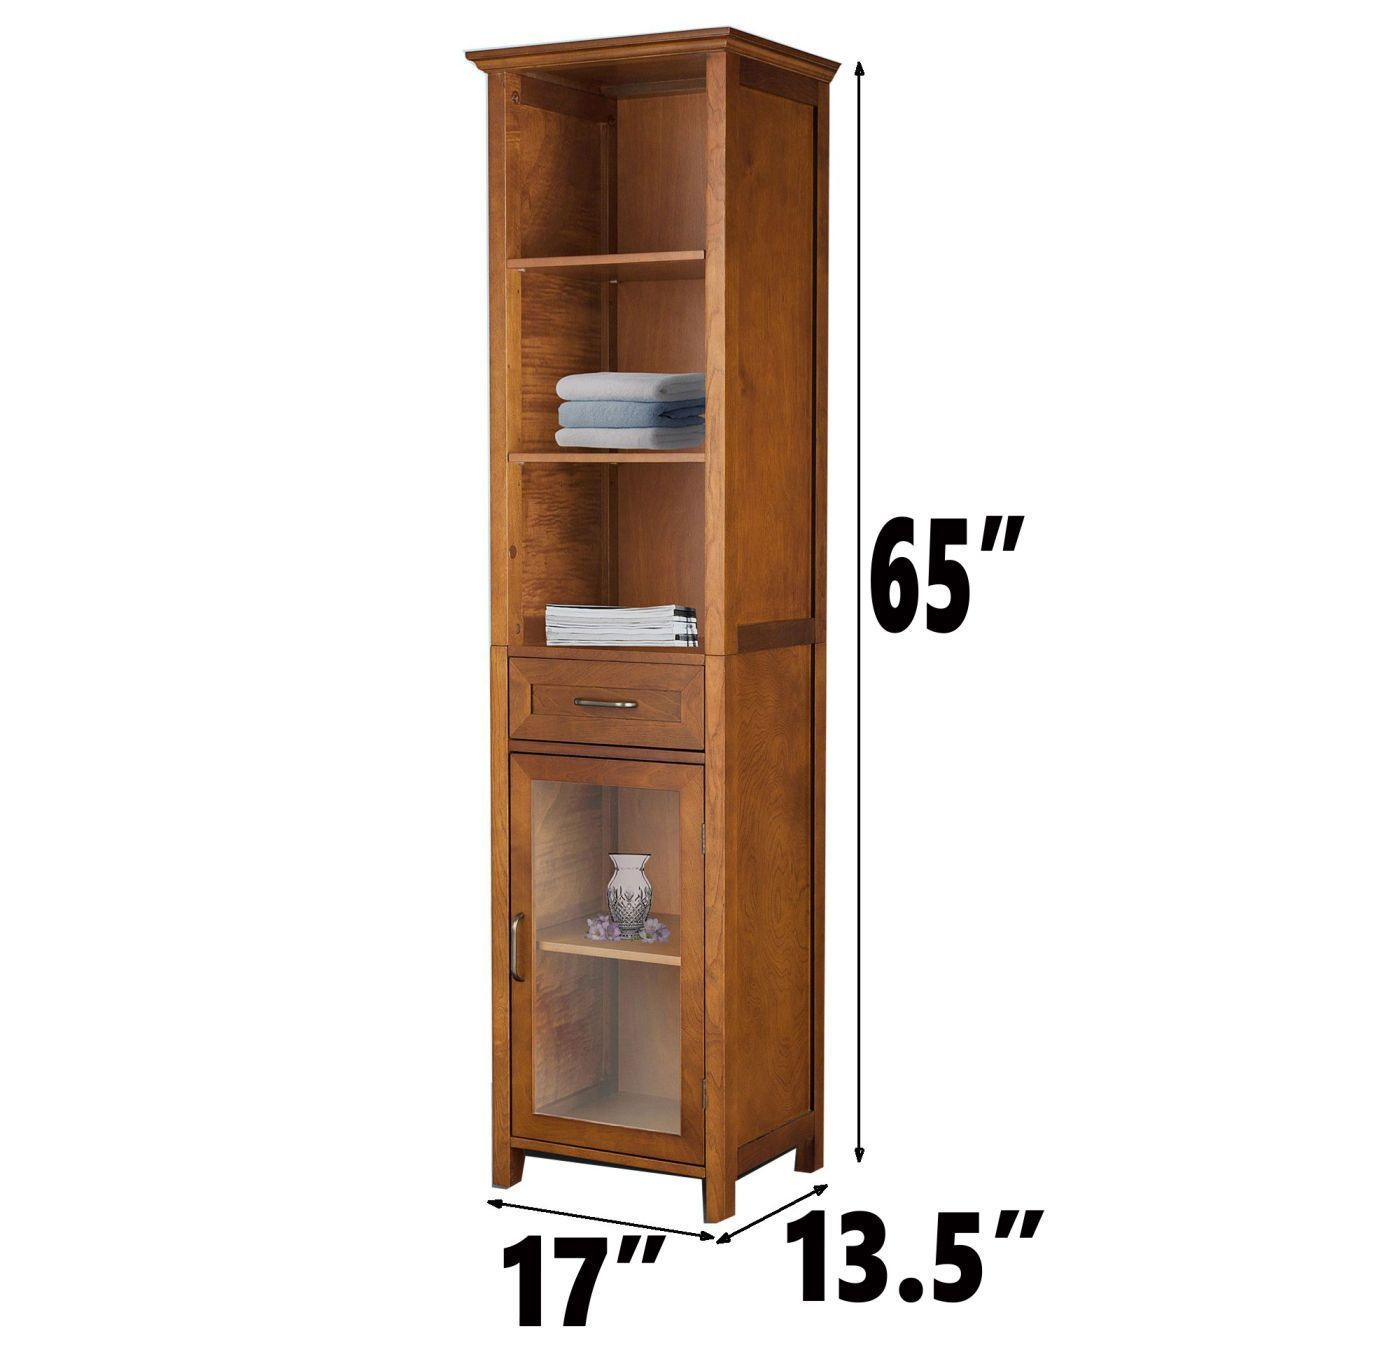 Oak Finish Linen Tower Bathroom Towel Storage Cabinet Tall Wooden Organizer